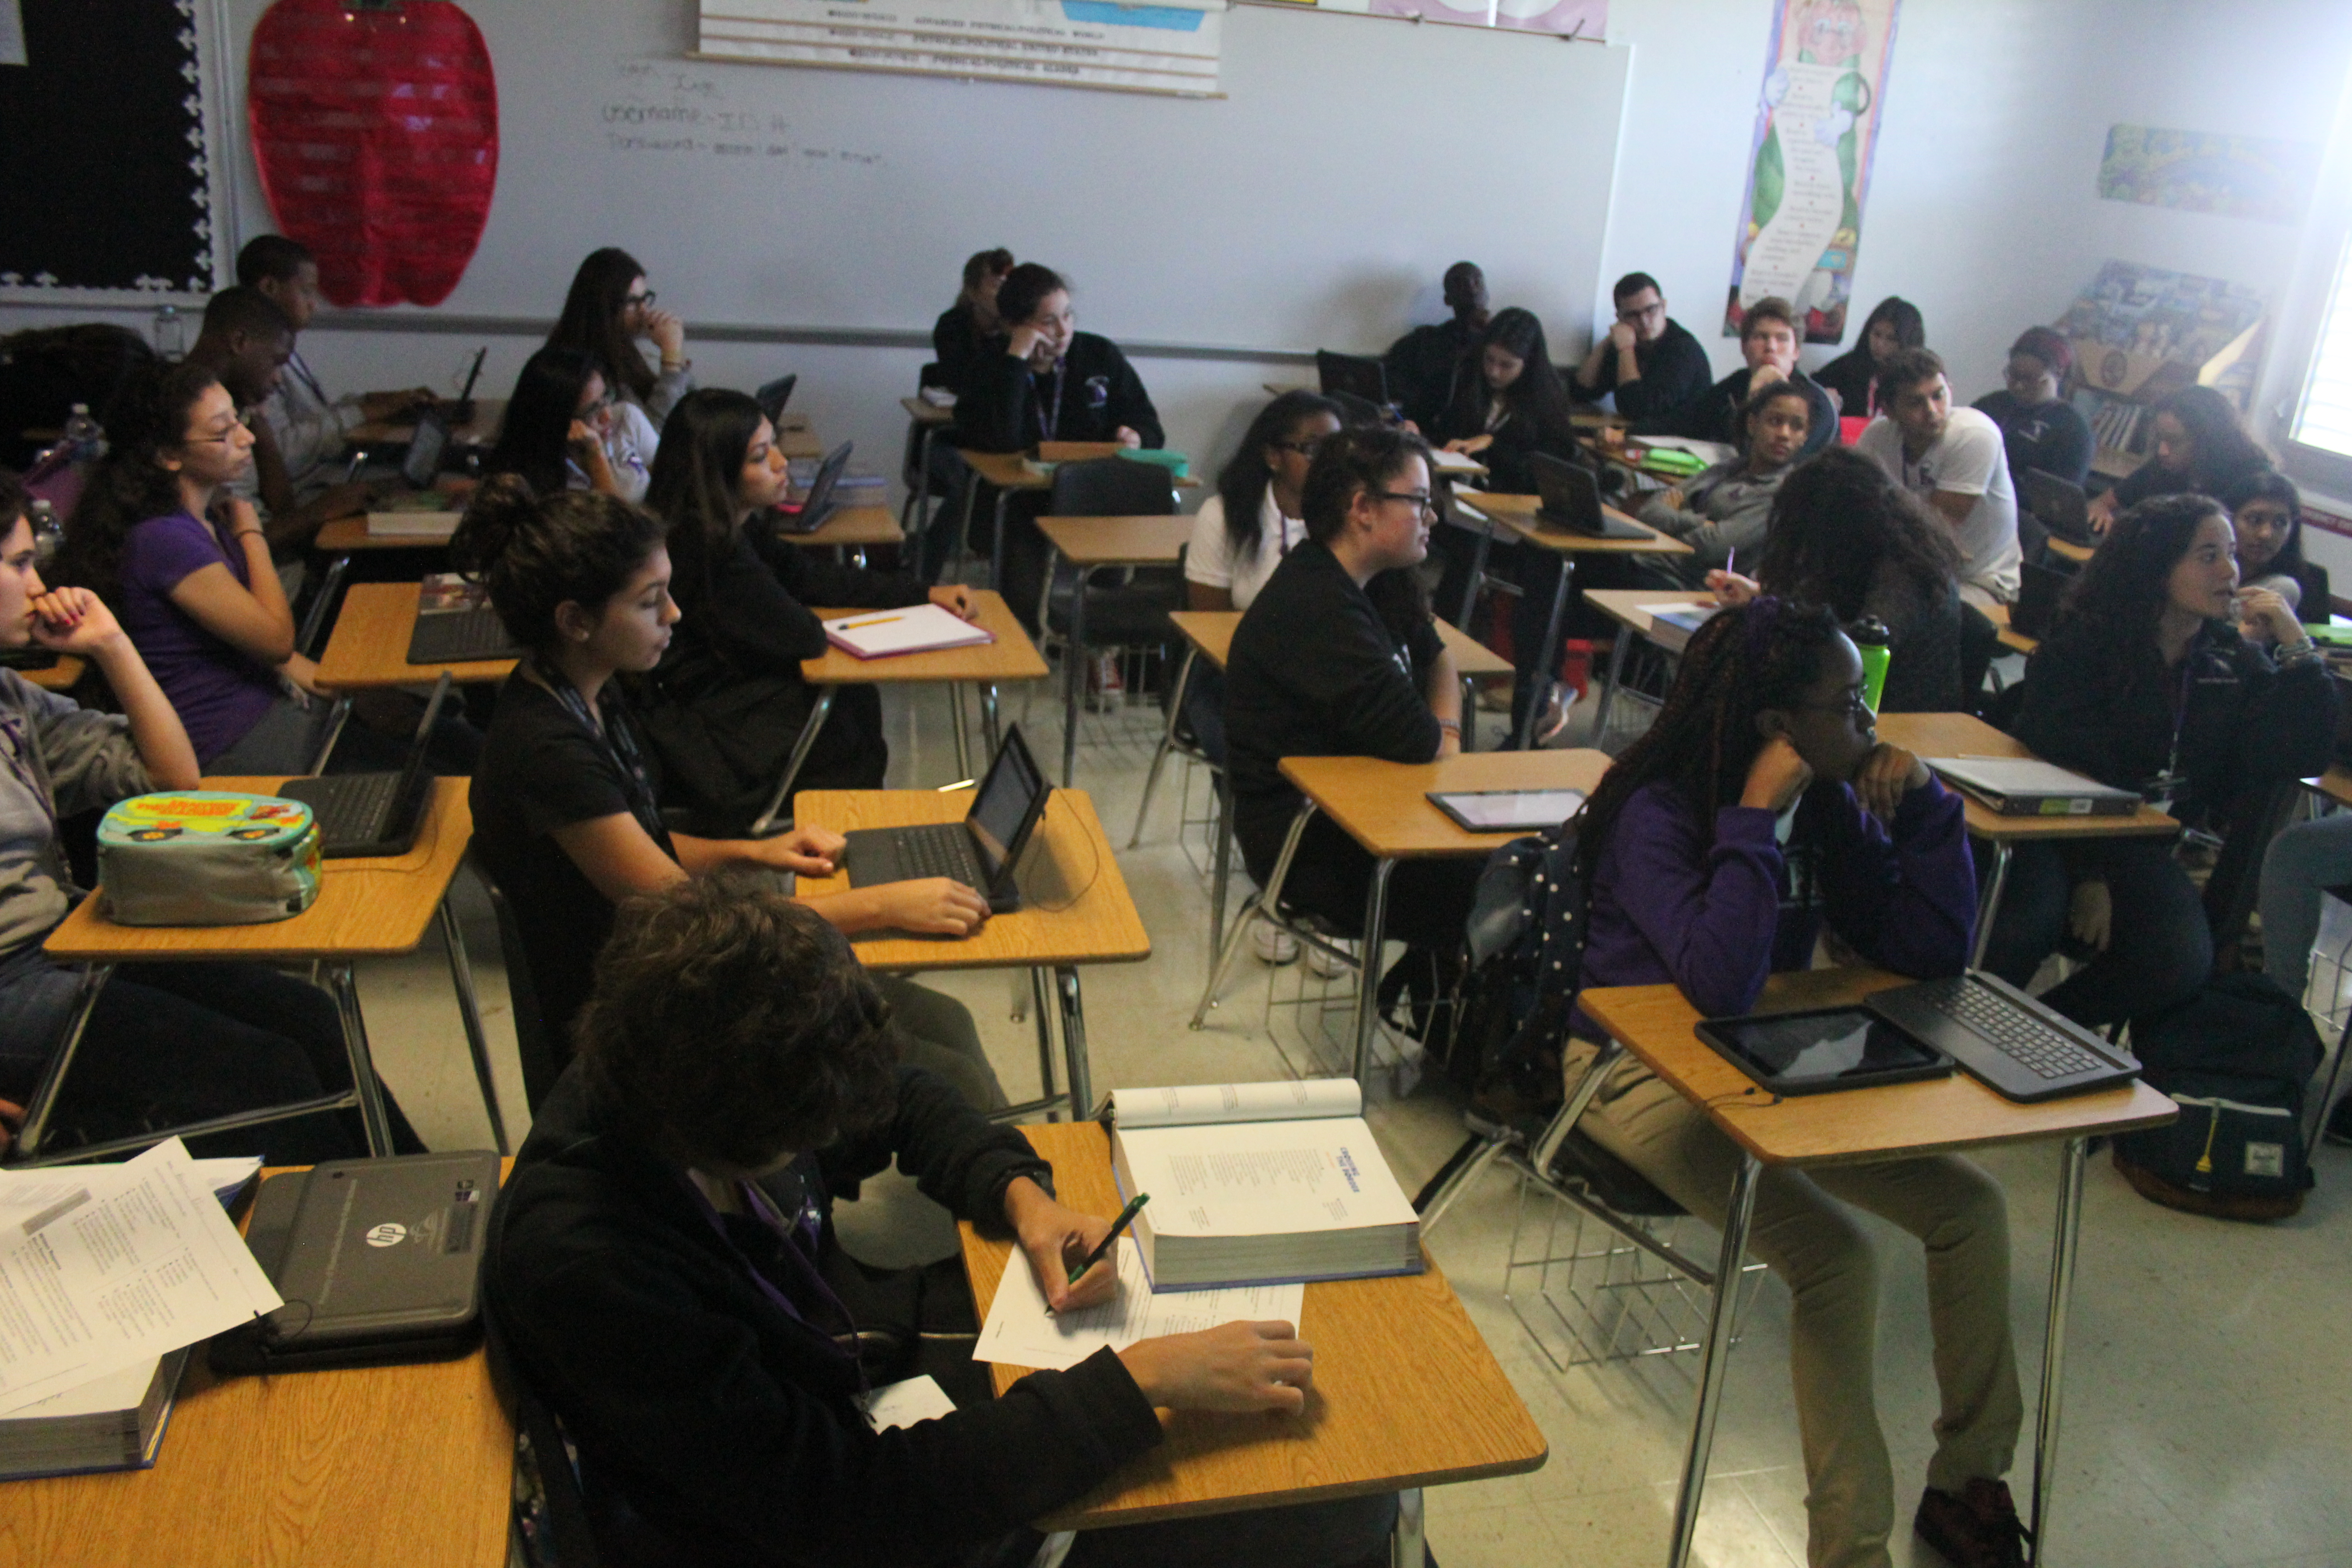 Class sizes need amending